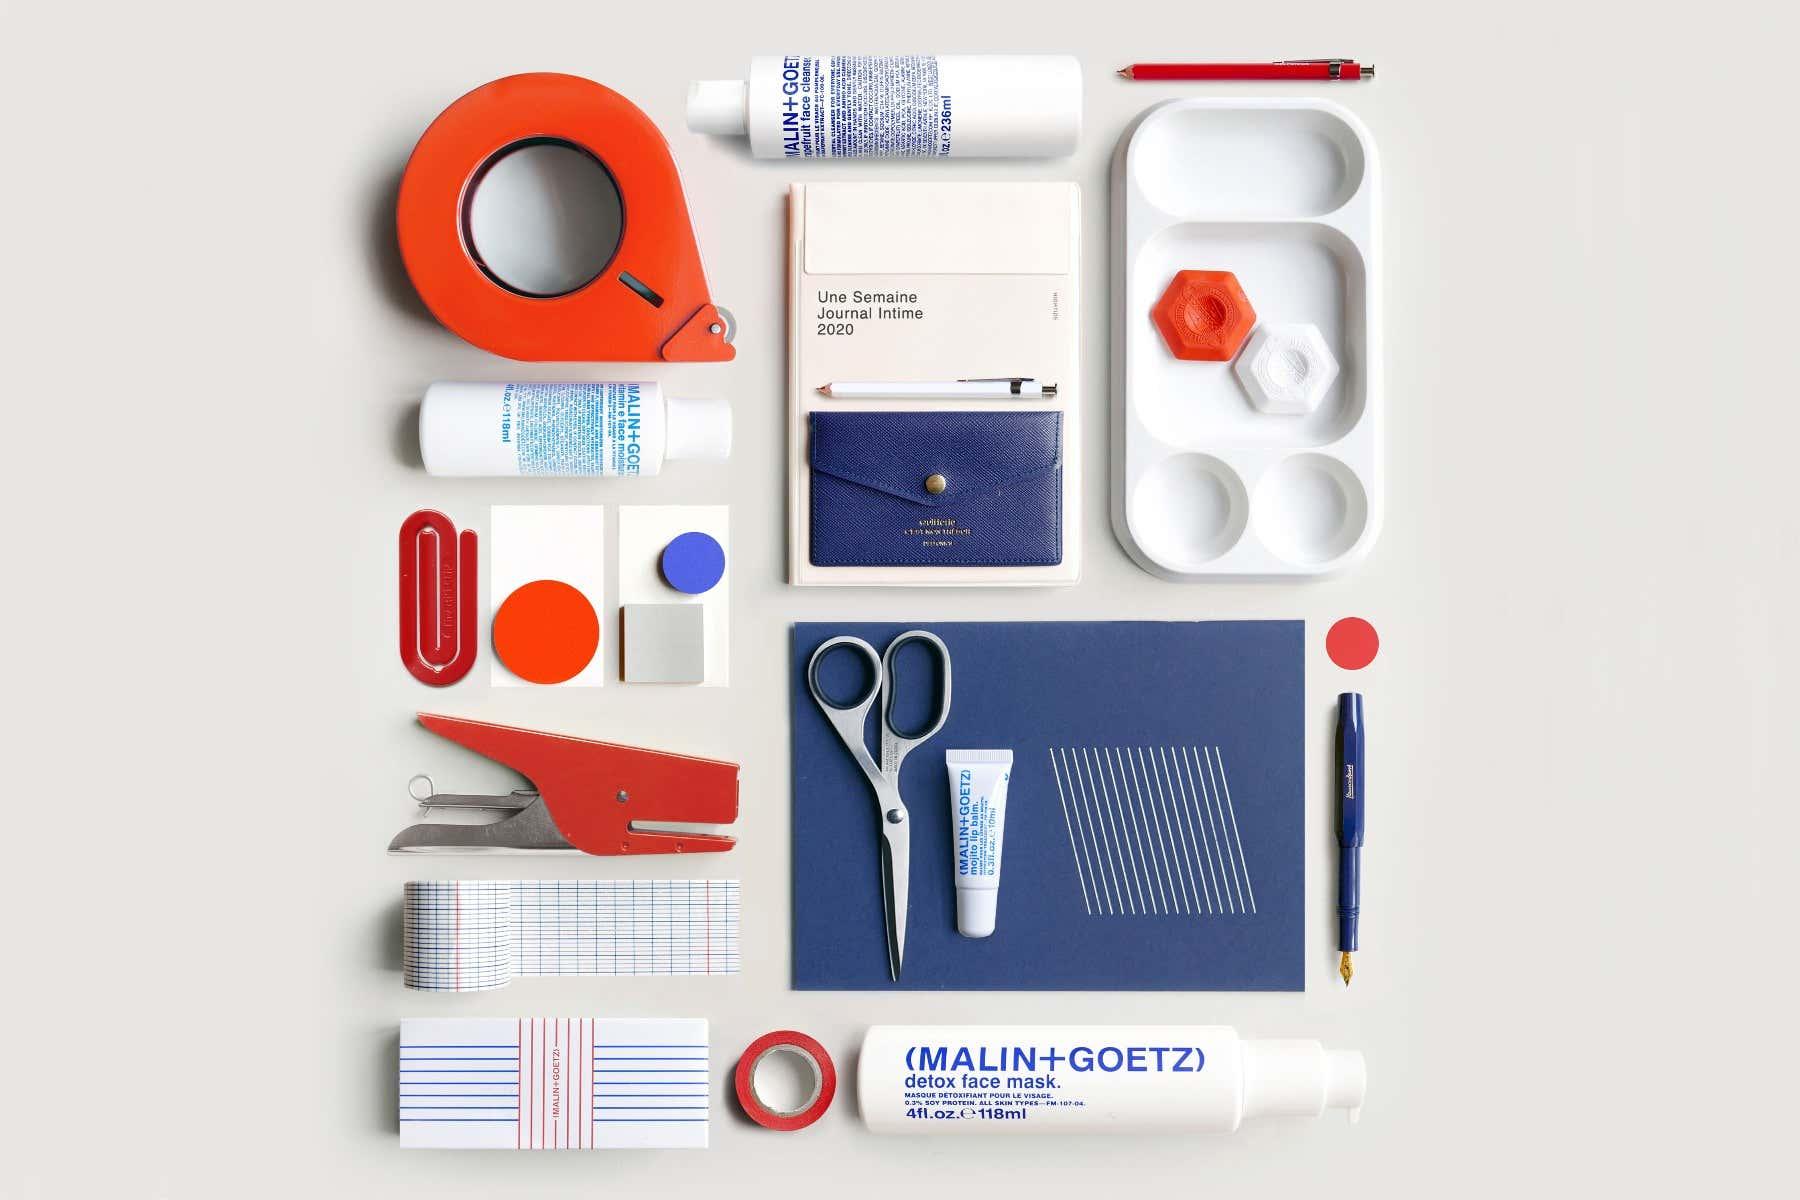 MALIN+GOETZ x PRESENT / & / CORRECT